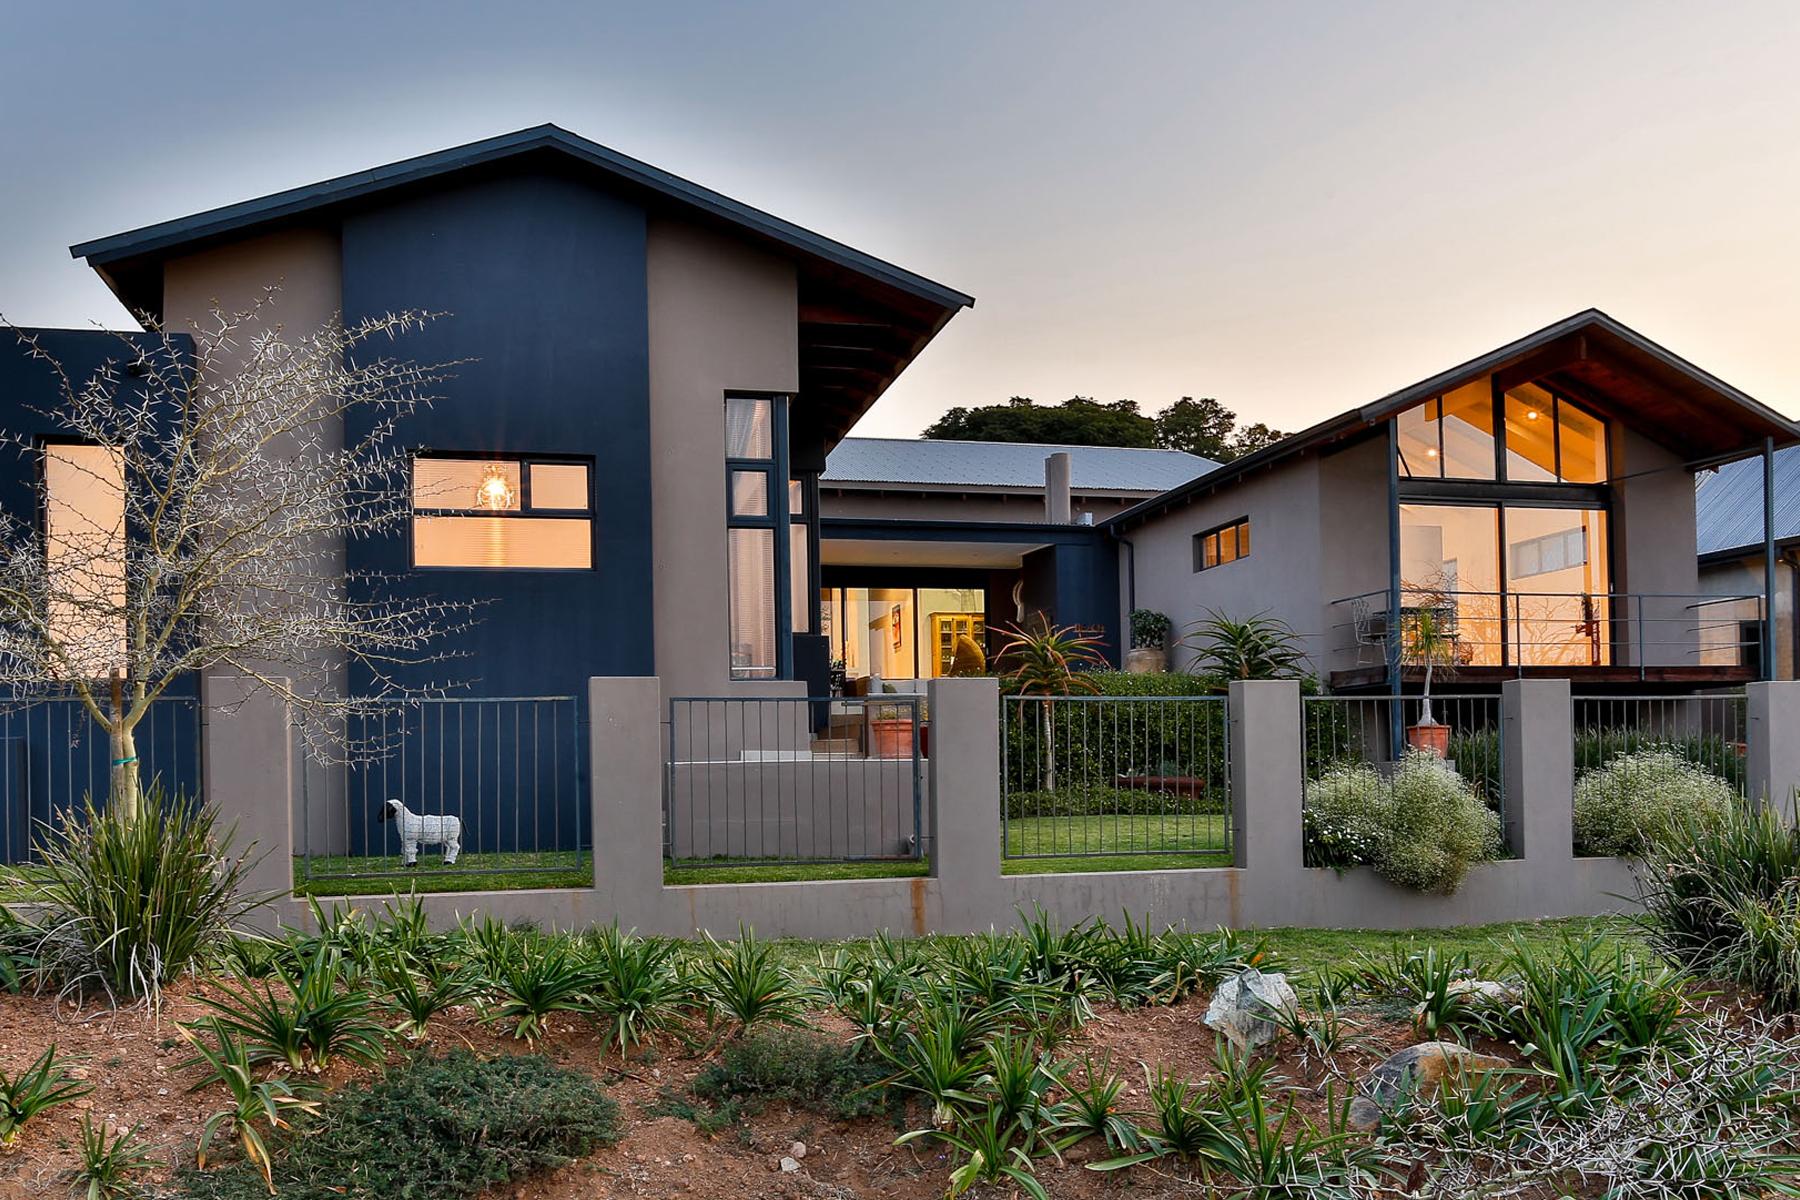 Single Family Home for Sale at Modderfontein Johannesburg, Gauteng, 1610 South Africa